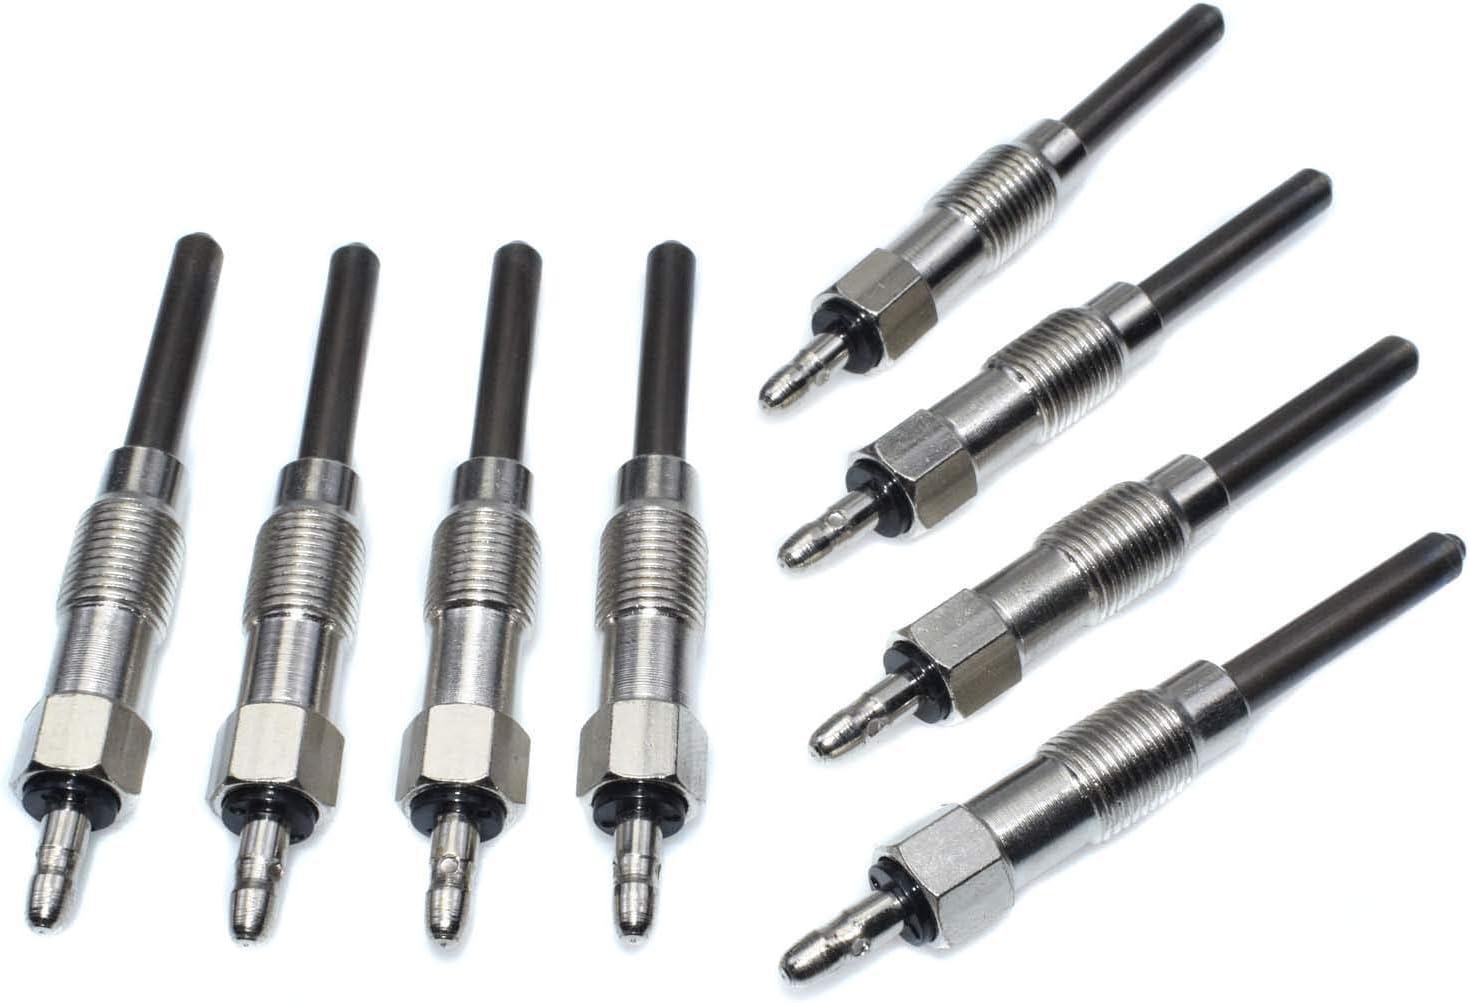 8PCS 6.5 L 6.2 L Diesel Glow Plugs M998 M1035 M1037 For Hummer 5584164,12338771